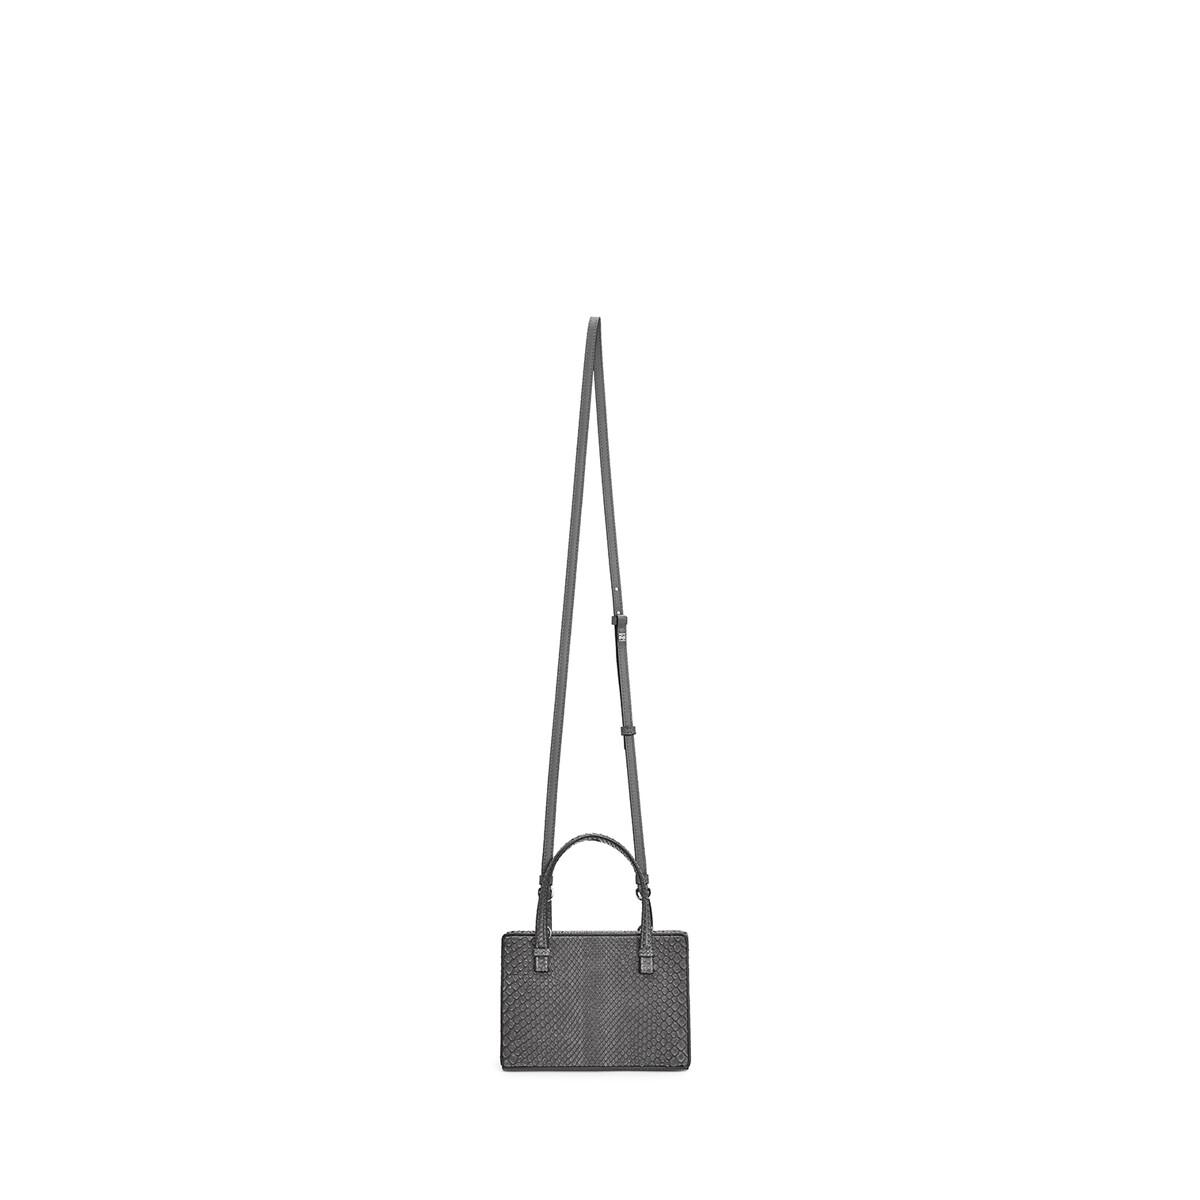 LOEWE Postal Small Bag Grey front